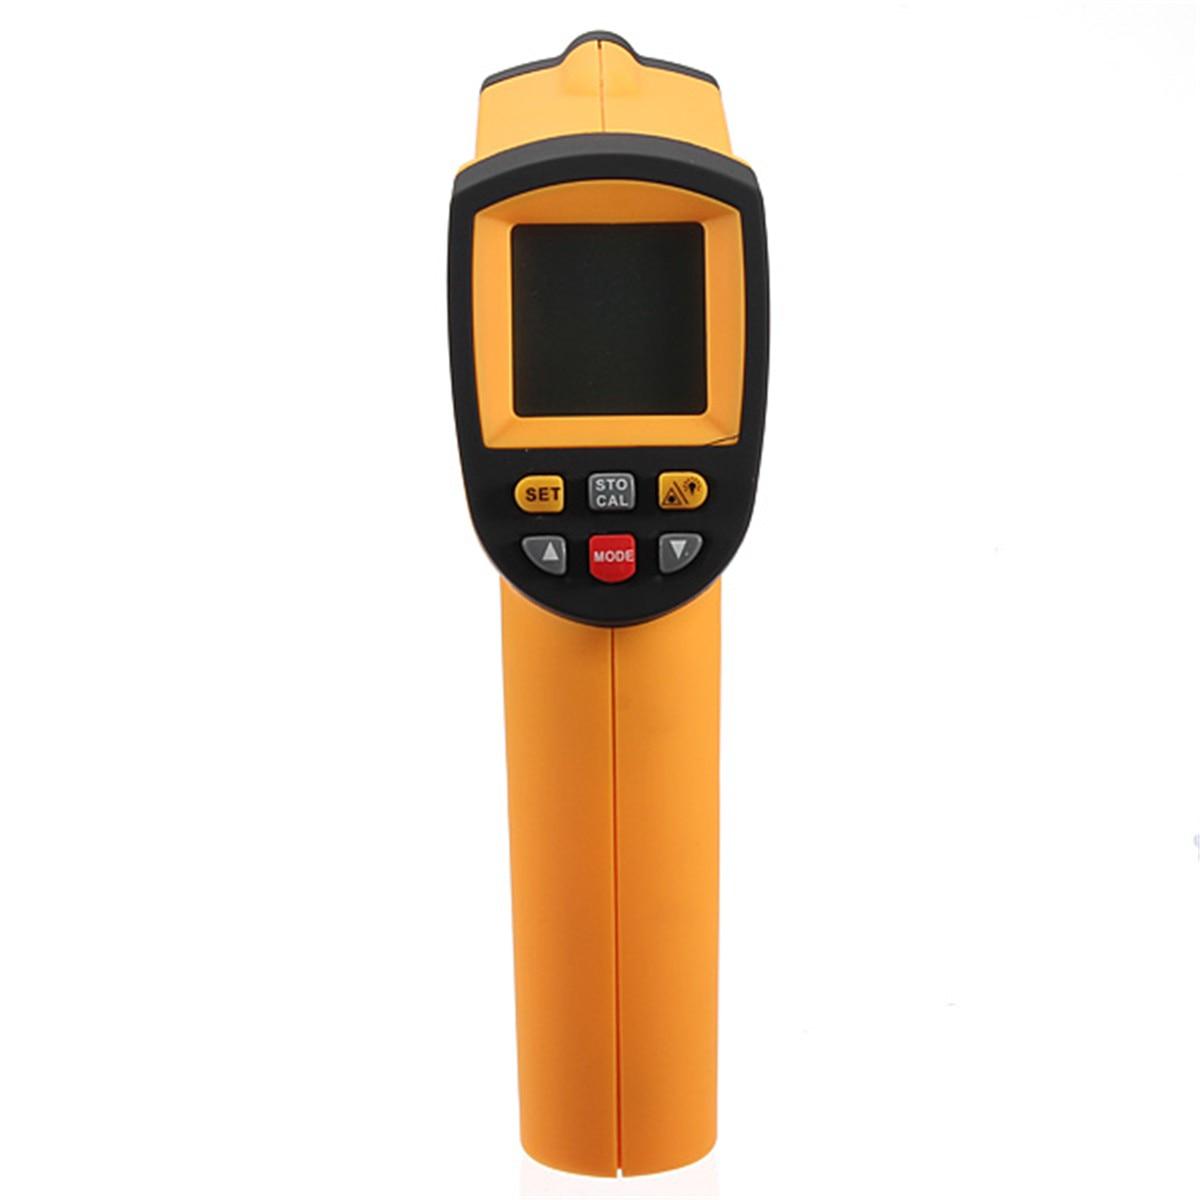 GM900 LCD Digital Infrared Thermometer Gun IR Laster Temperature Meter Non contact Handheld Pyrometer 50~900 Degree Centigrade